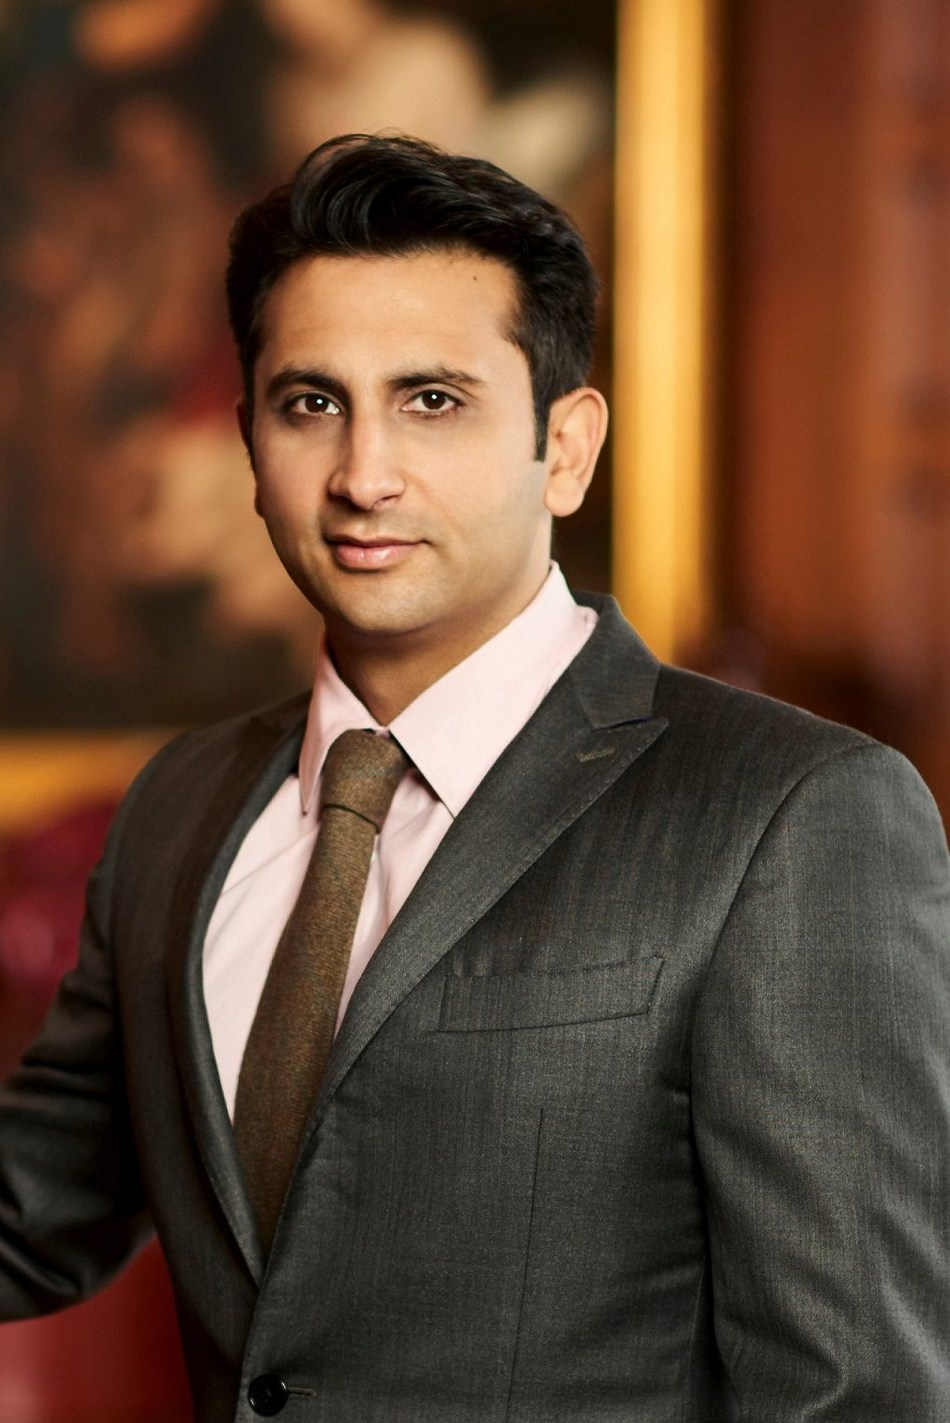 Mr. Adar C. Poonawalla, CEO & Executive Director, Serum Institute of India Pvt. Ltd. (PRNewsfoto/Panacea Biotec Ltd.)